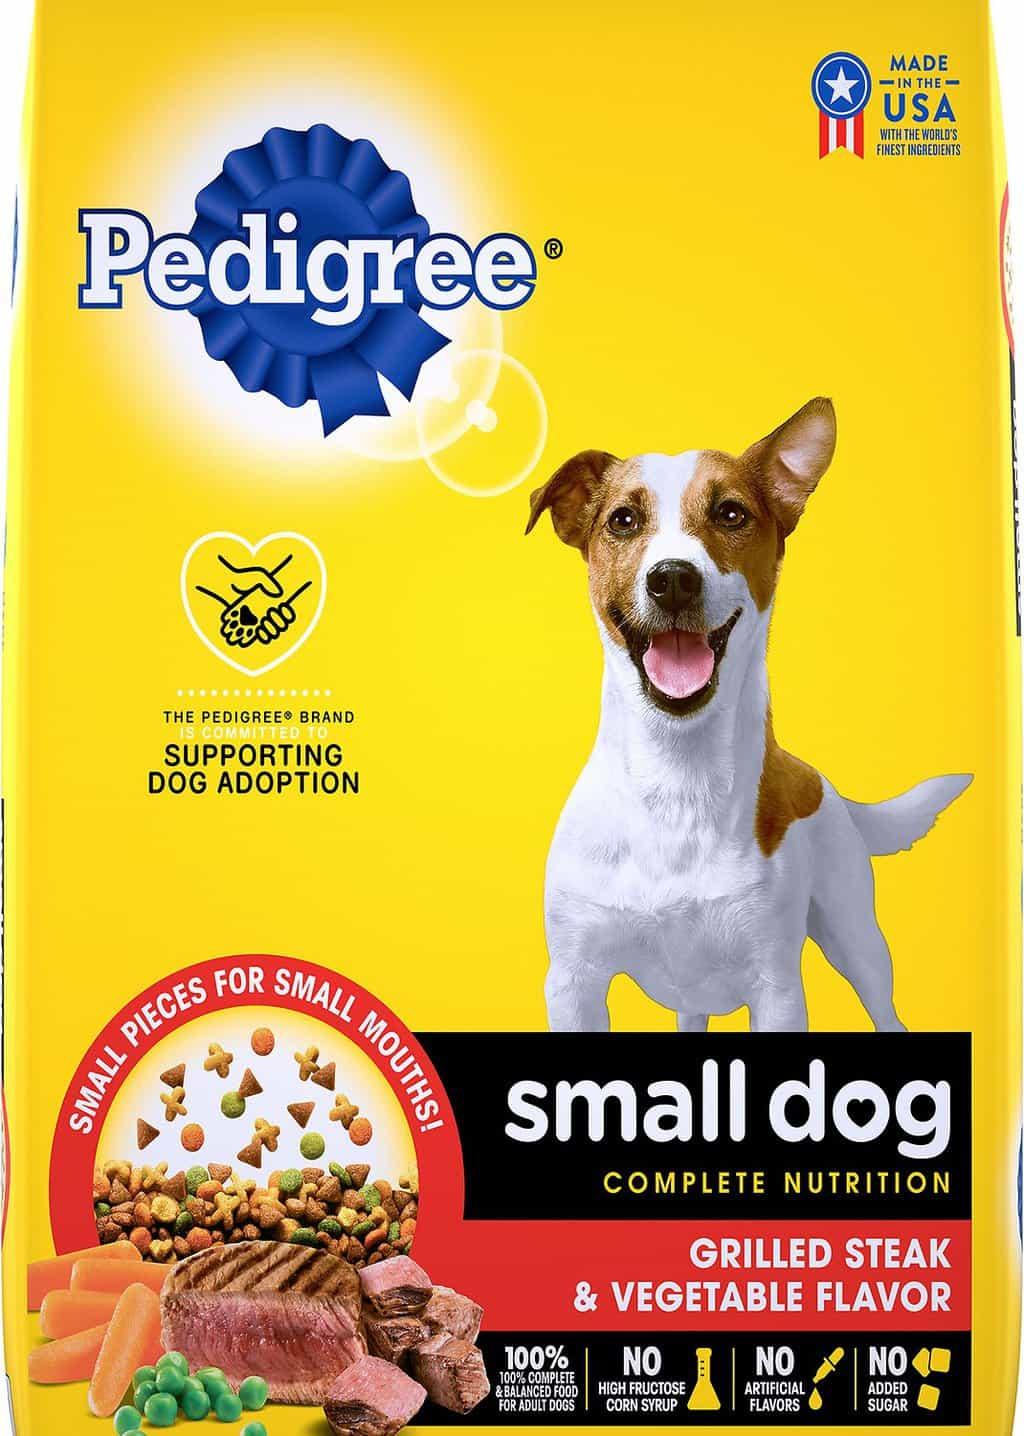 Pedigree Dog Food: [year] Reviews, Recalls & Coupons 13